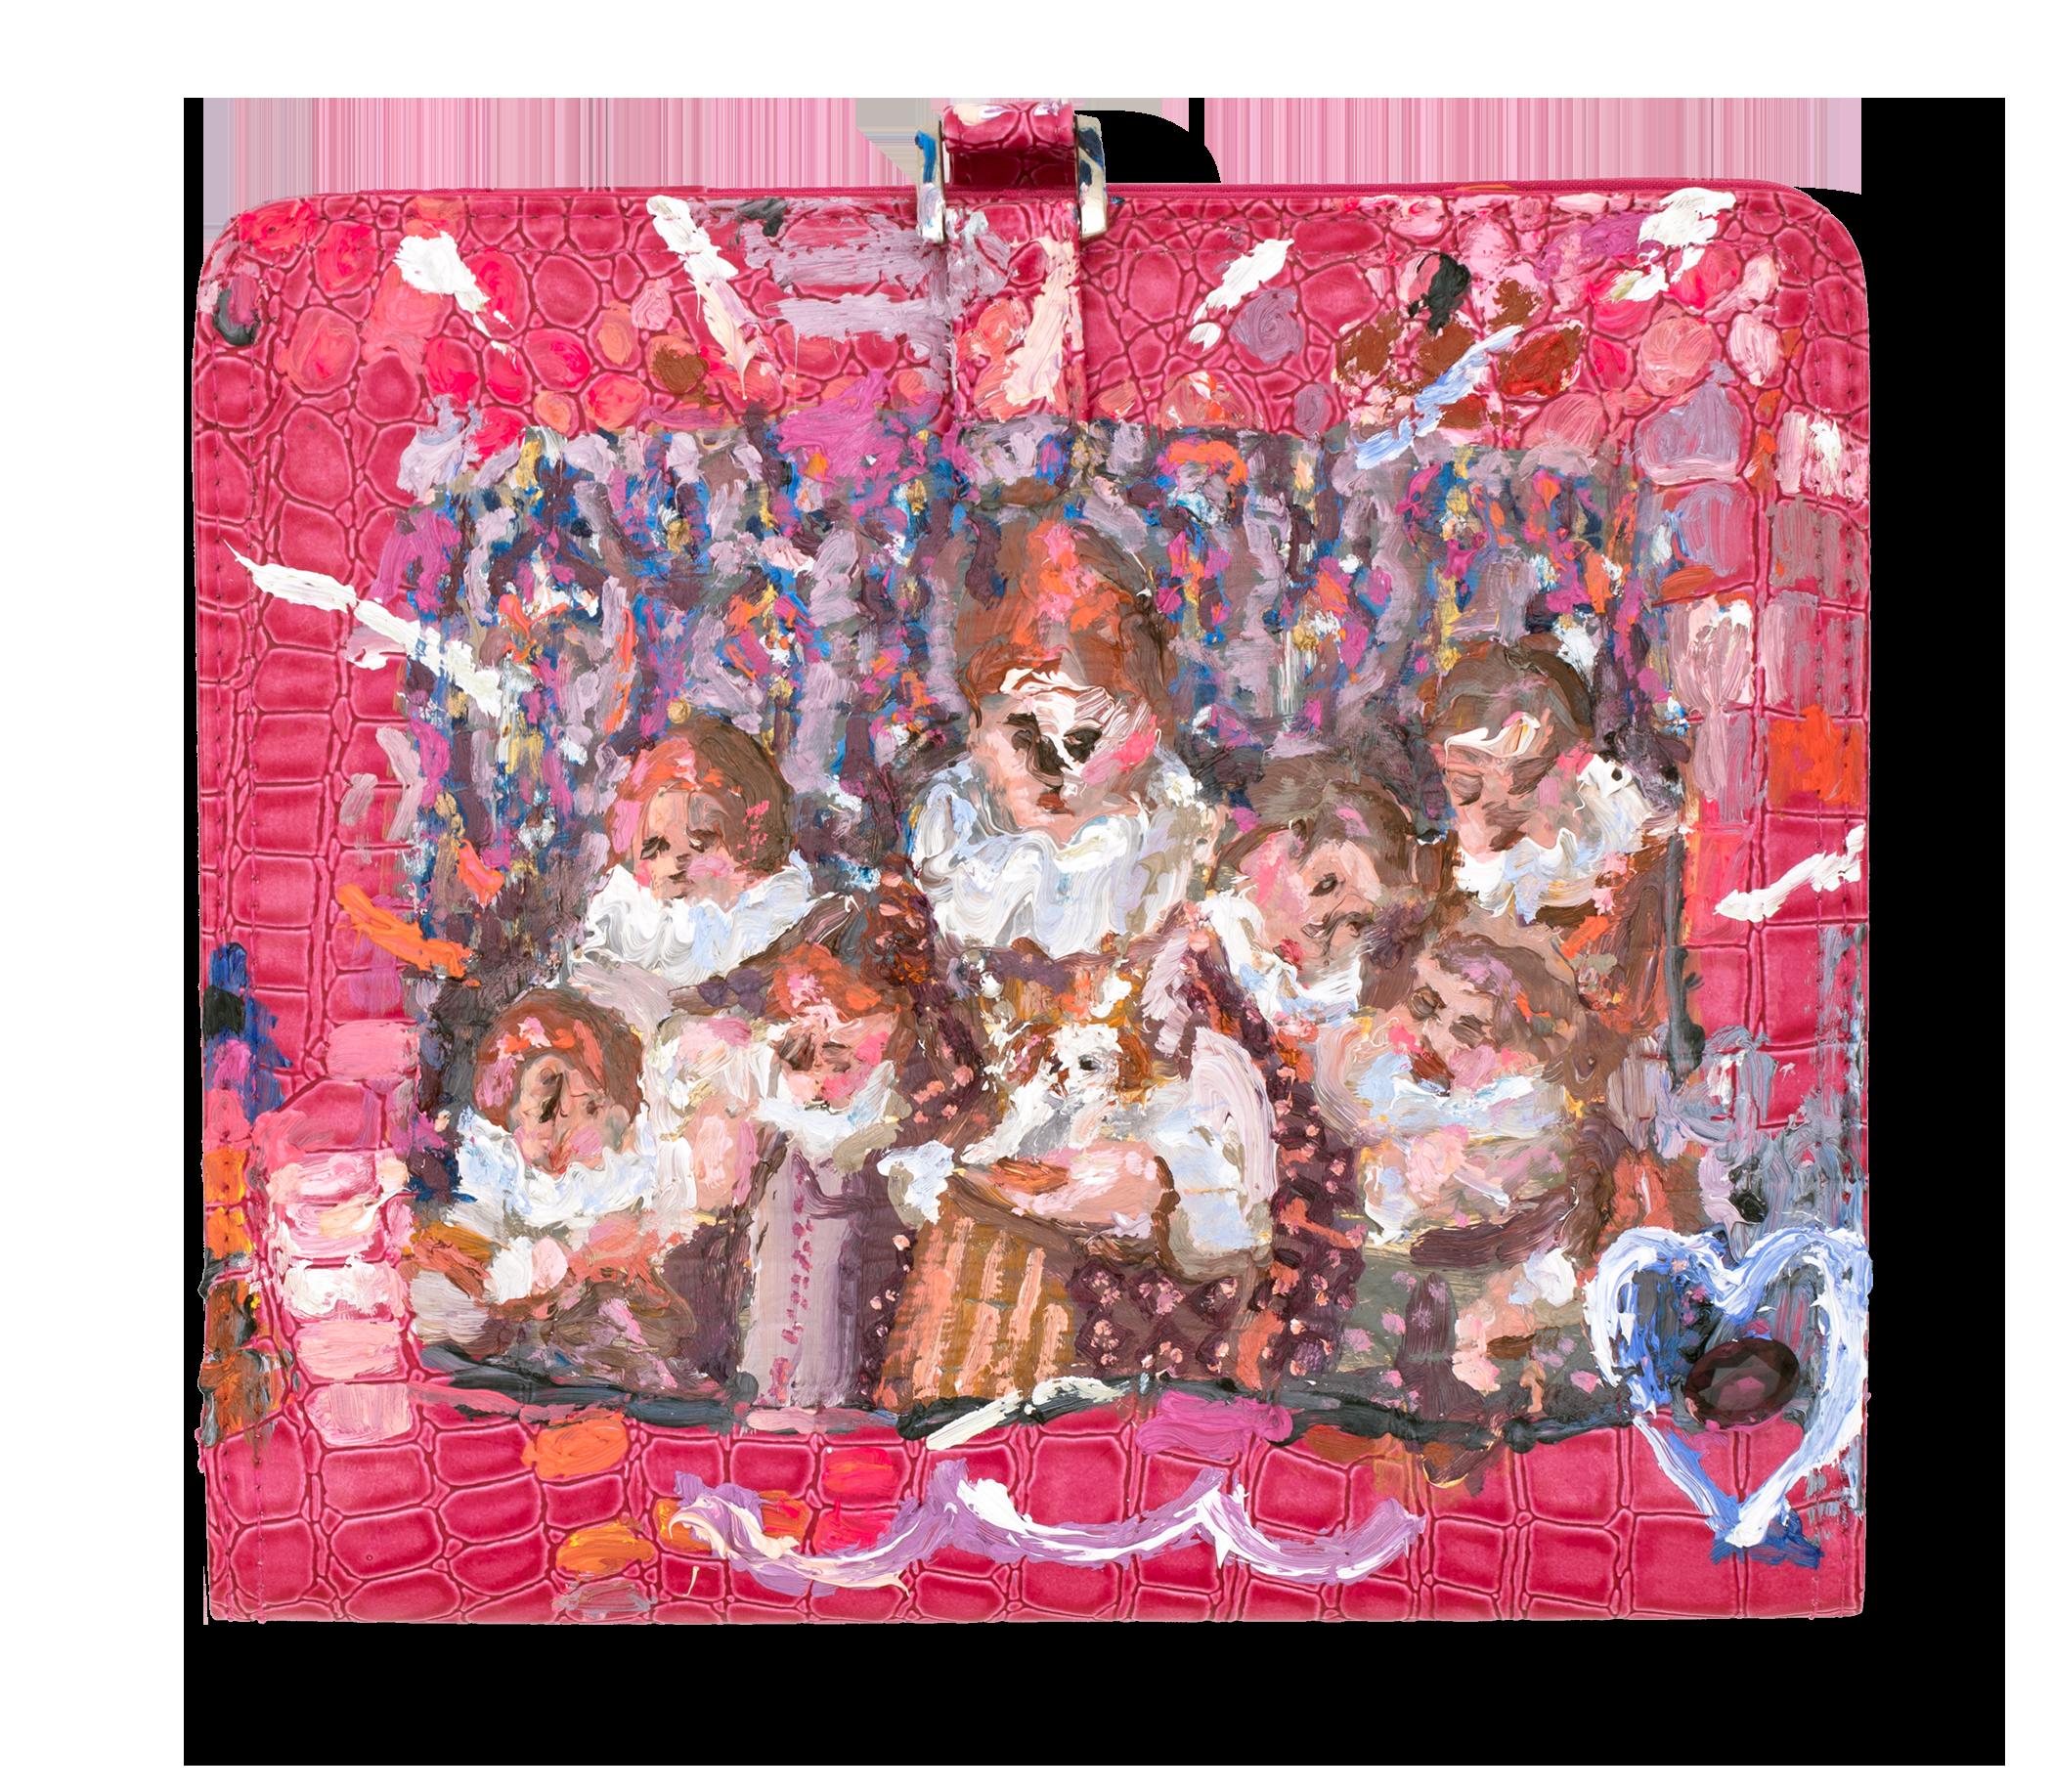 Croc royal gingers purse pg3s27